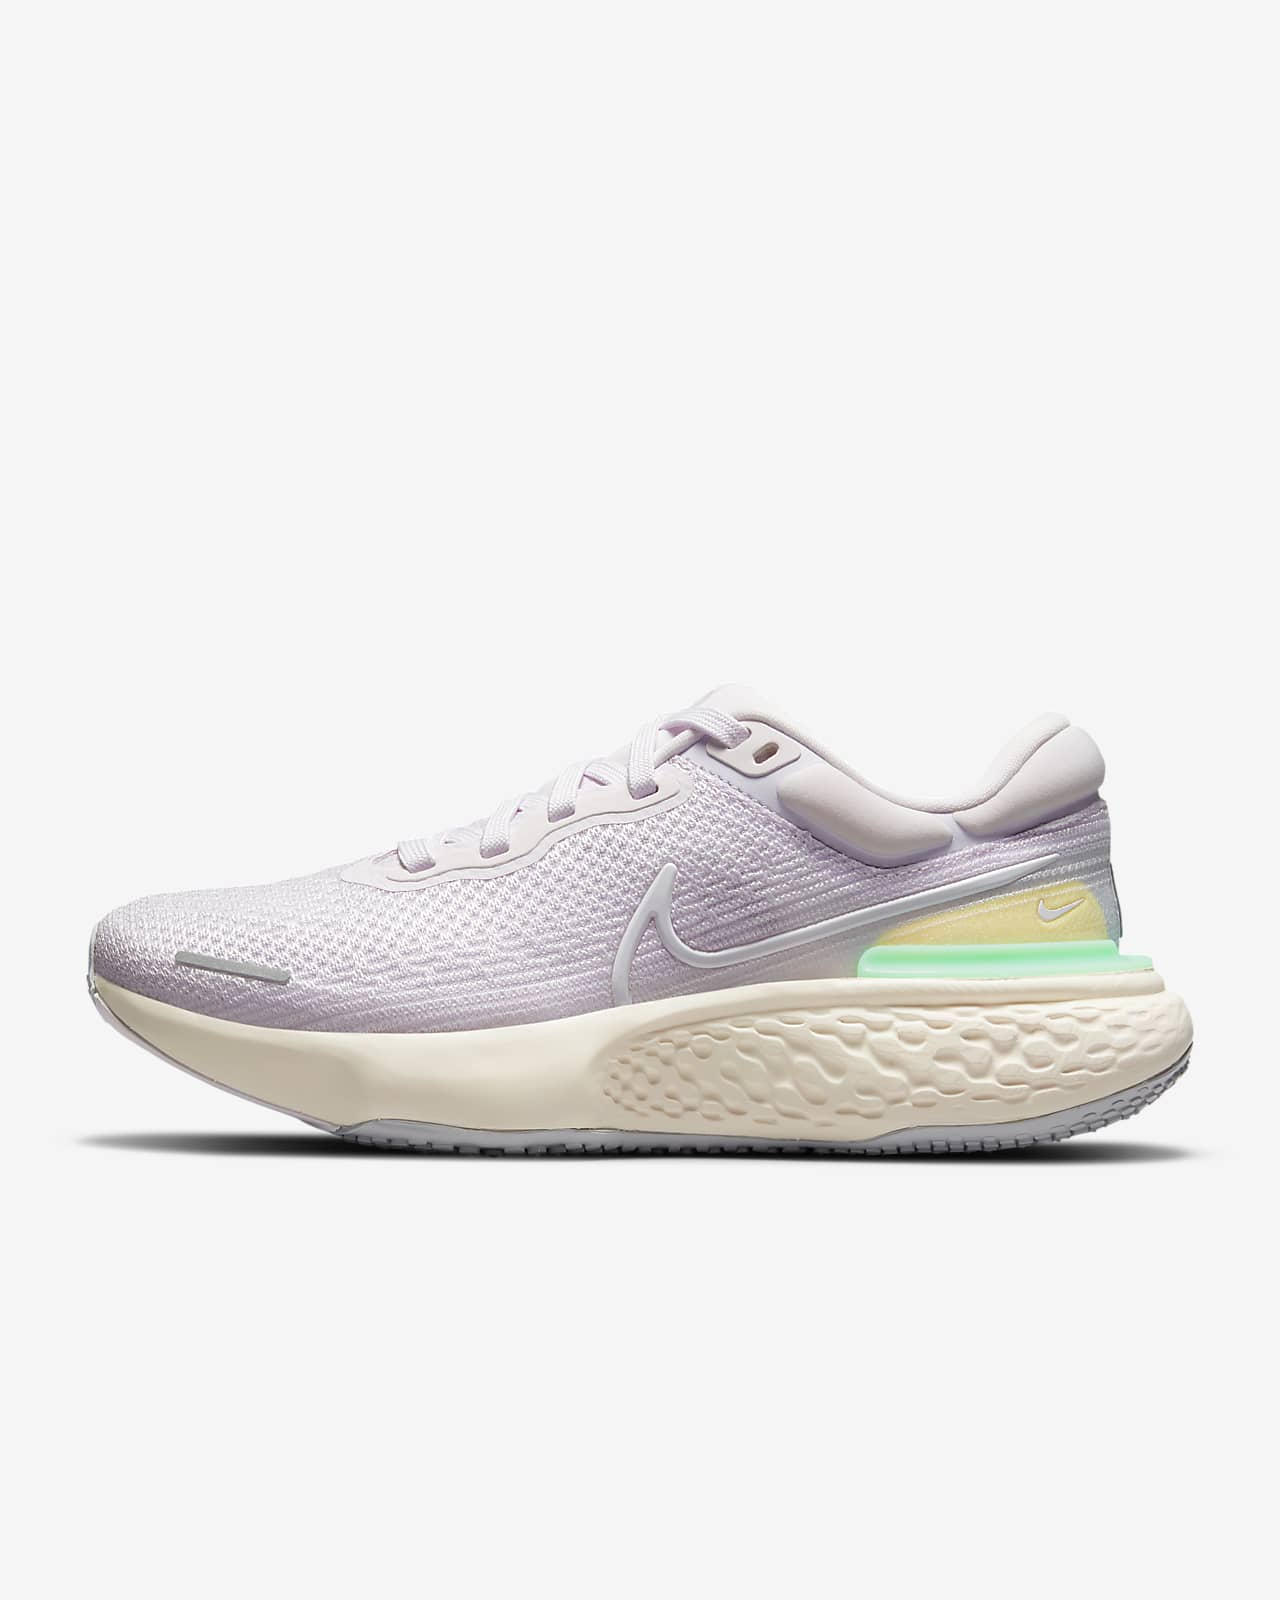 Damskie buty do biegania Nike ZoomX Invincible Run Flyknit